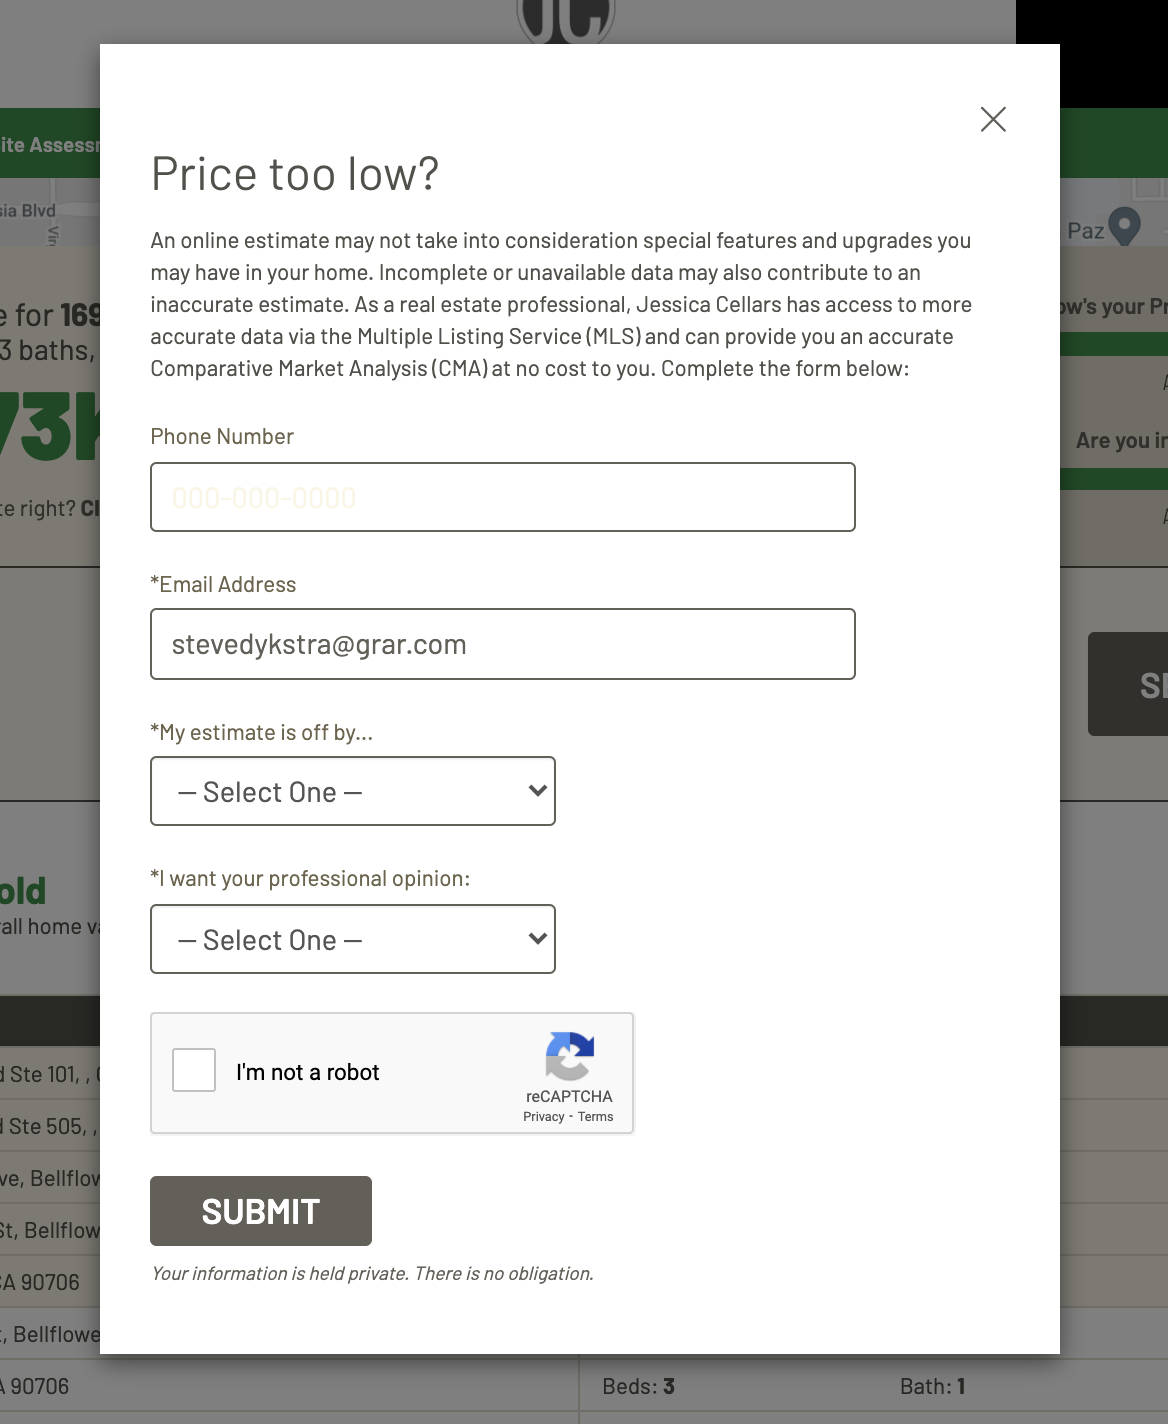 Price Too Low CTA